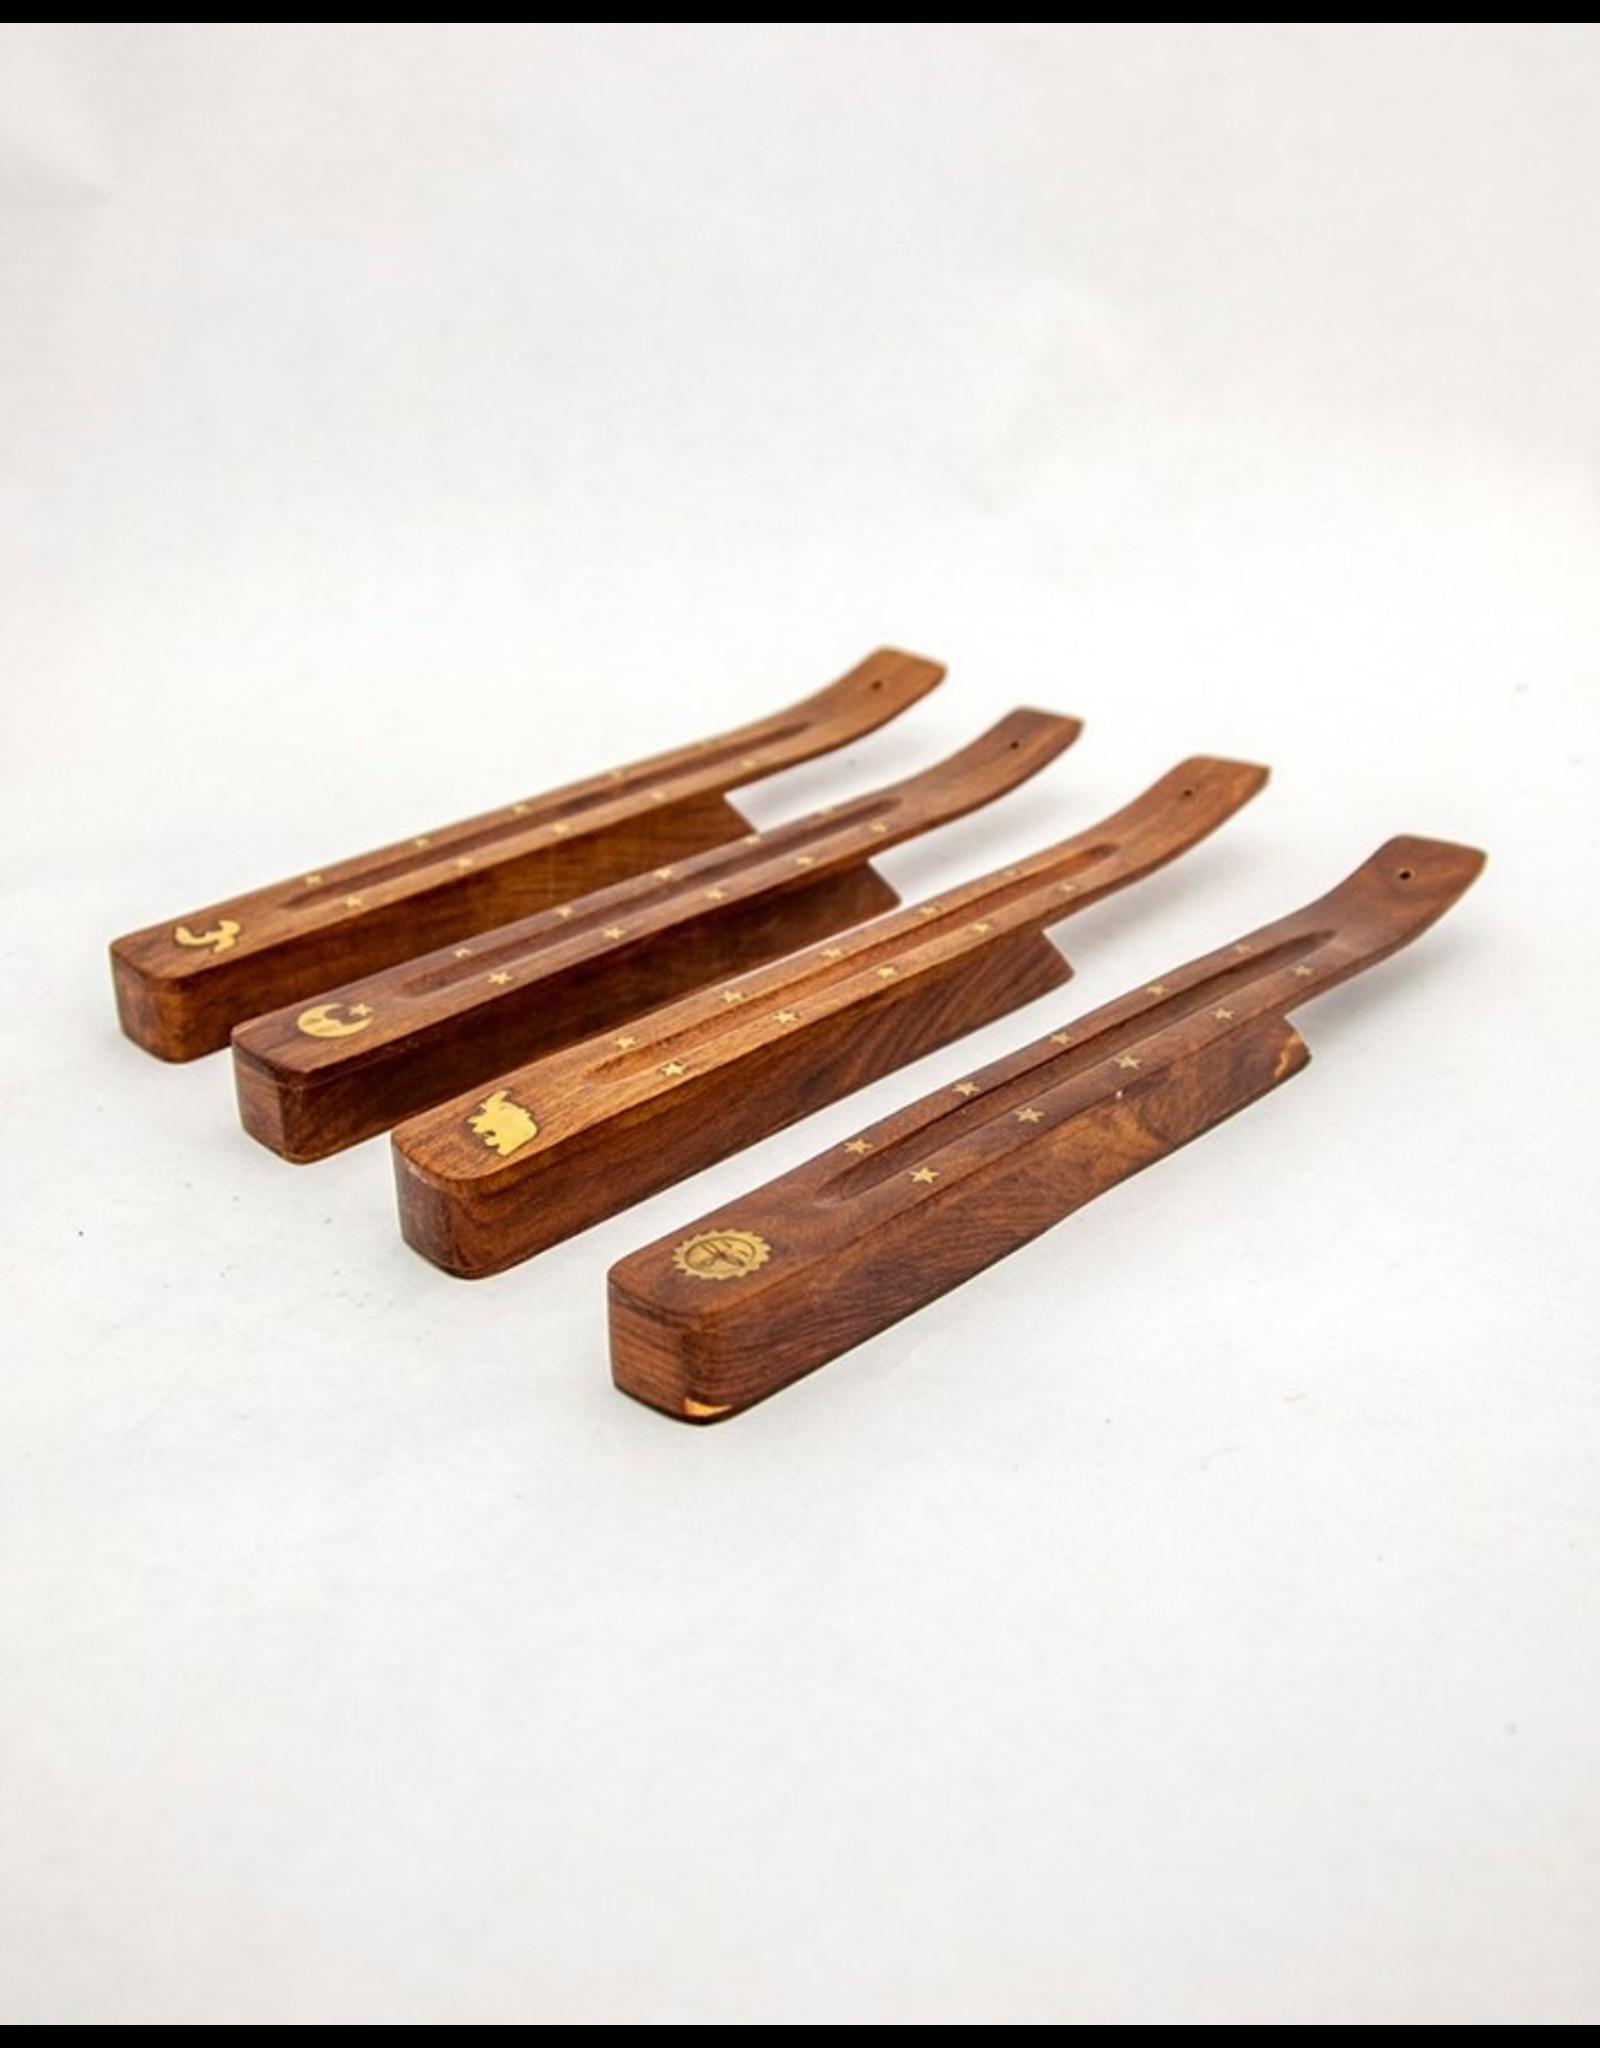 India Arts Shisham Wood Box Ash Catcher